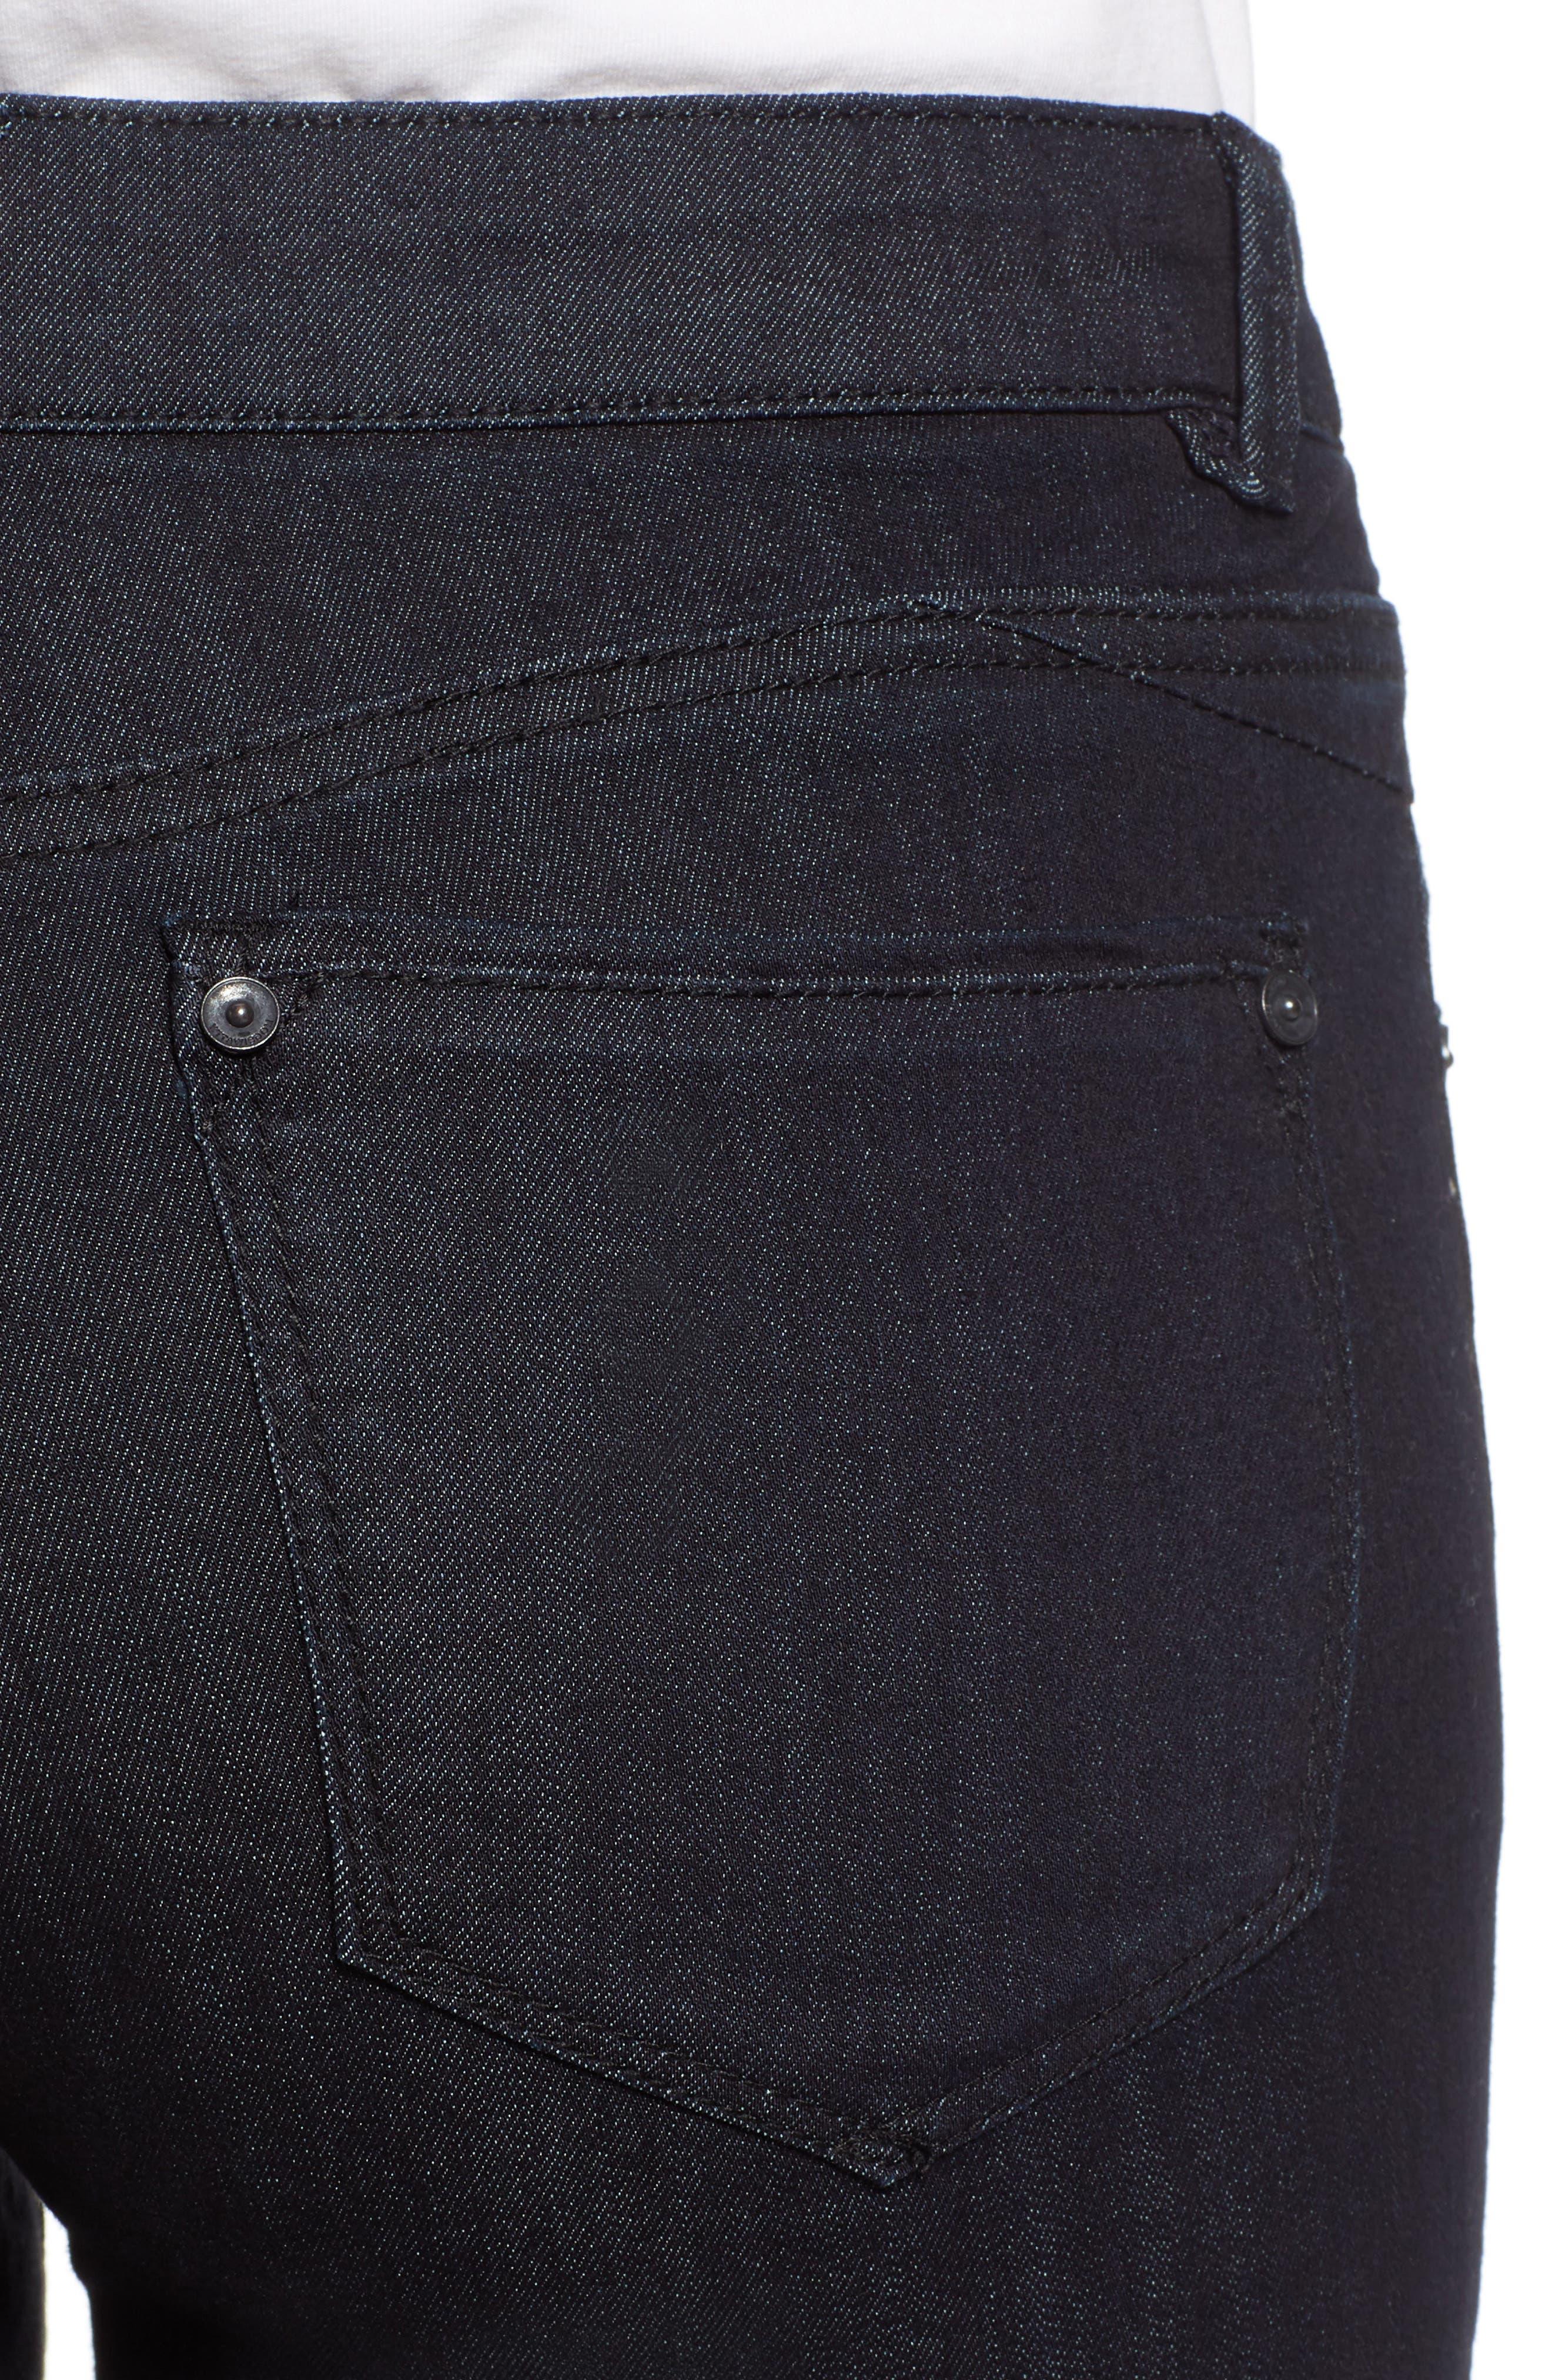 Ab-solution Ankle Skinny Jeans,                             Alternate thumbnail 4, color,                             INDIGO